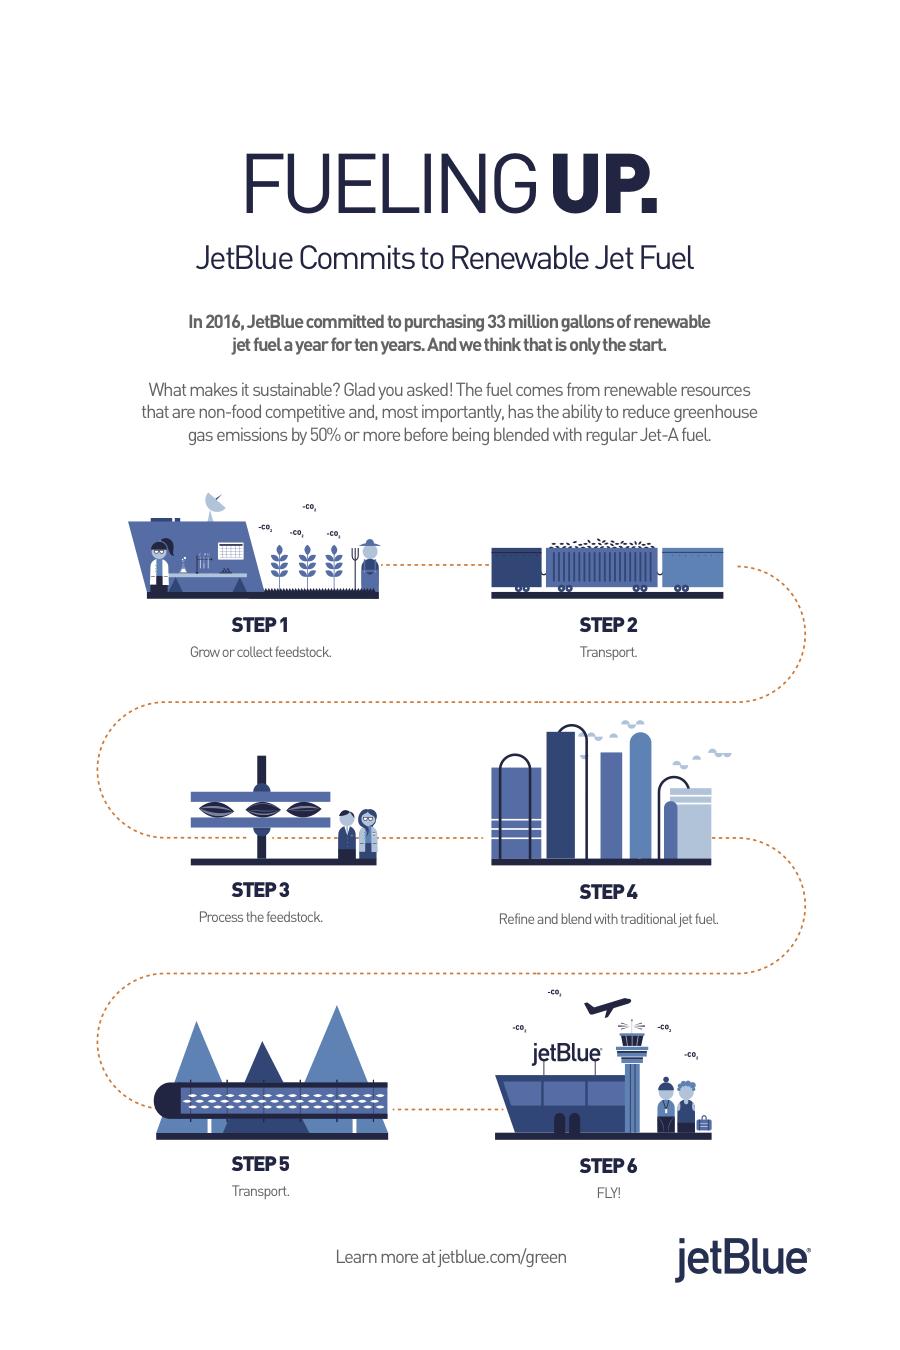 Jetblue Announces One Of The Largest Renewable Jet Fuel Purchase